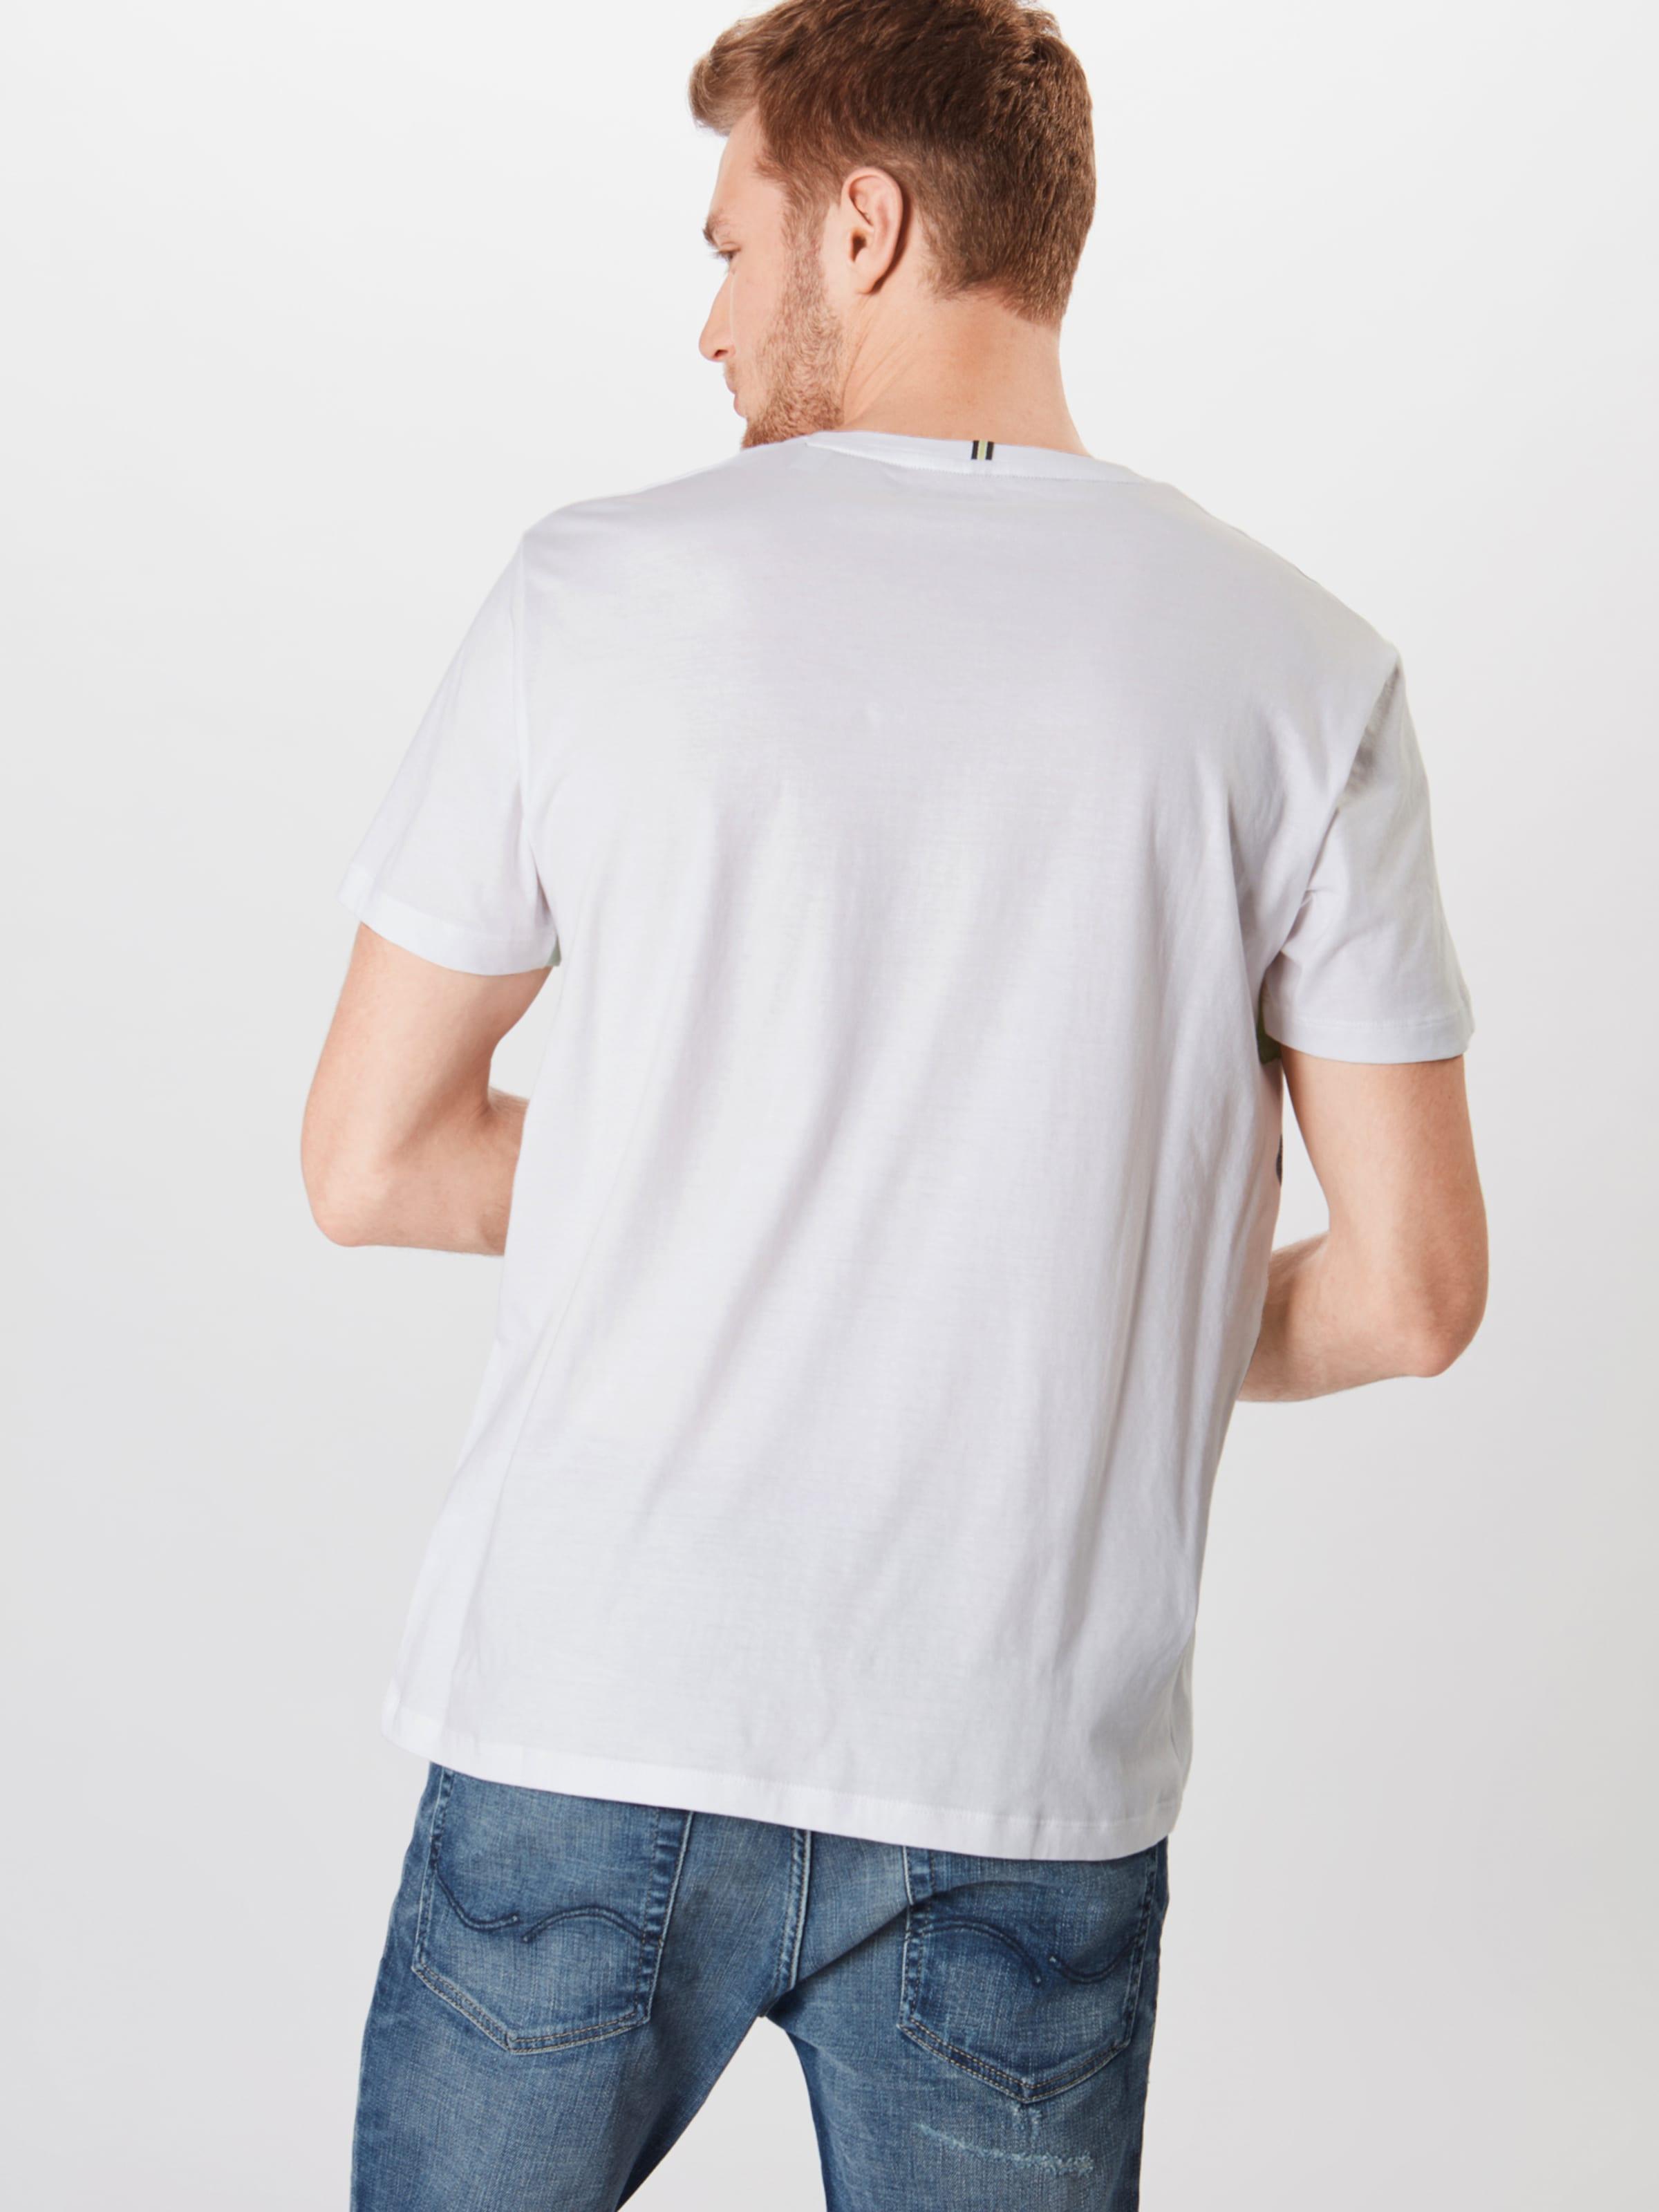 In Esprit Shirt Weiß BlauApfel Esprit UpqSVMz